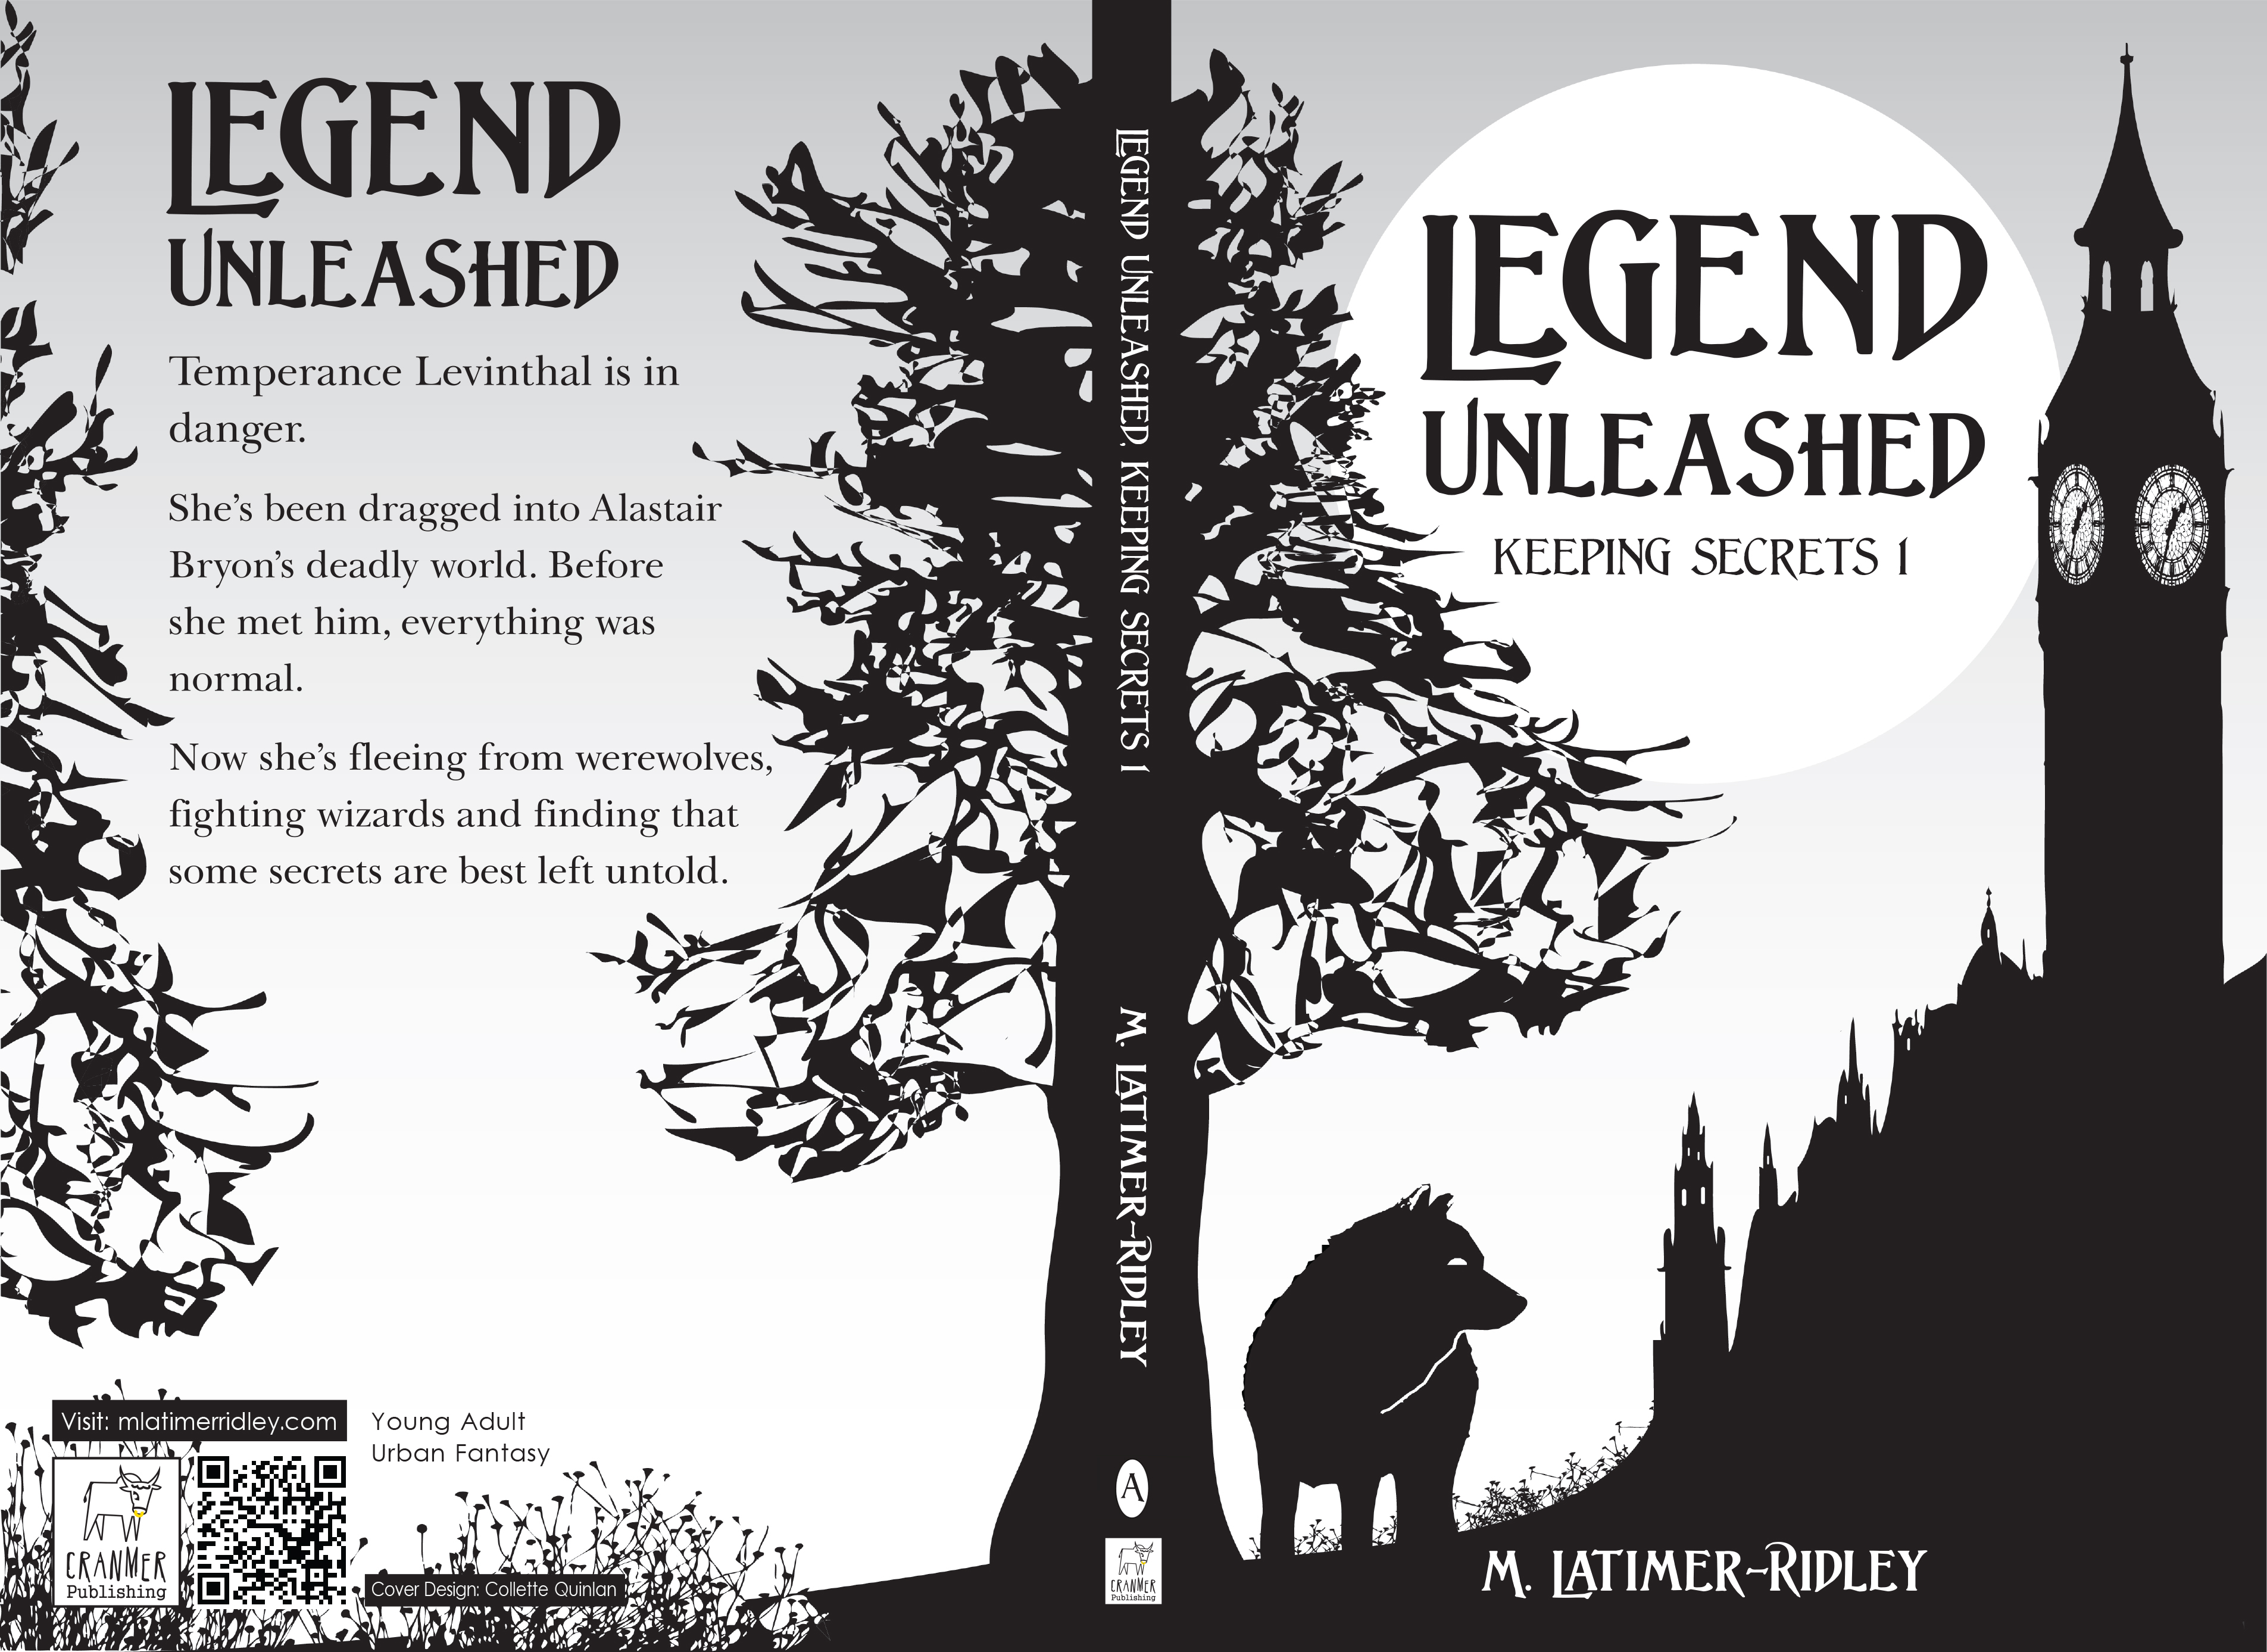 Legend Unleashed (Keeping Secrets, Book 1)  Chpt 4 by mlatimerridley